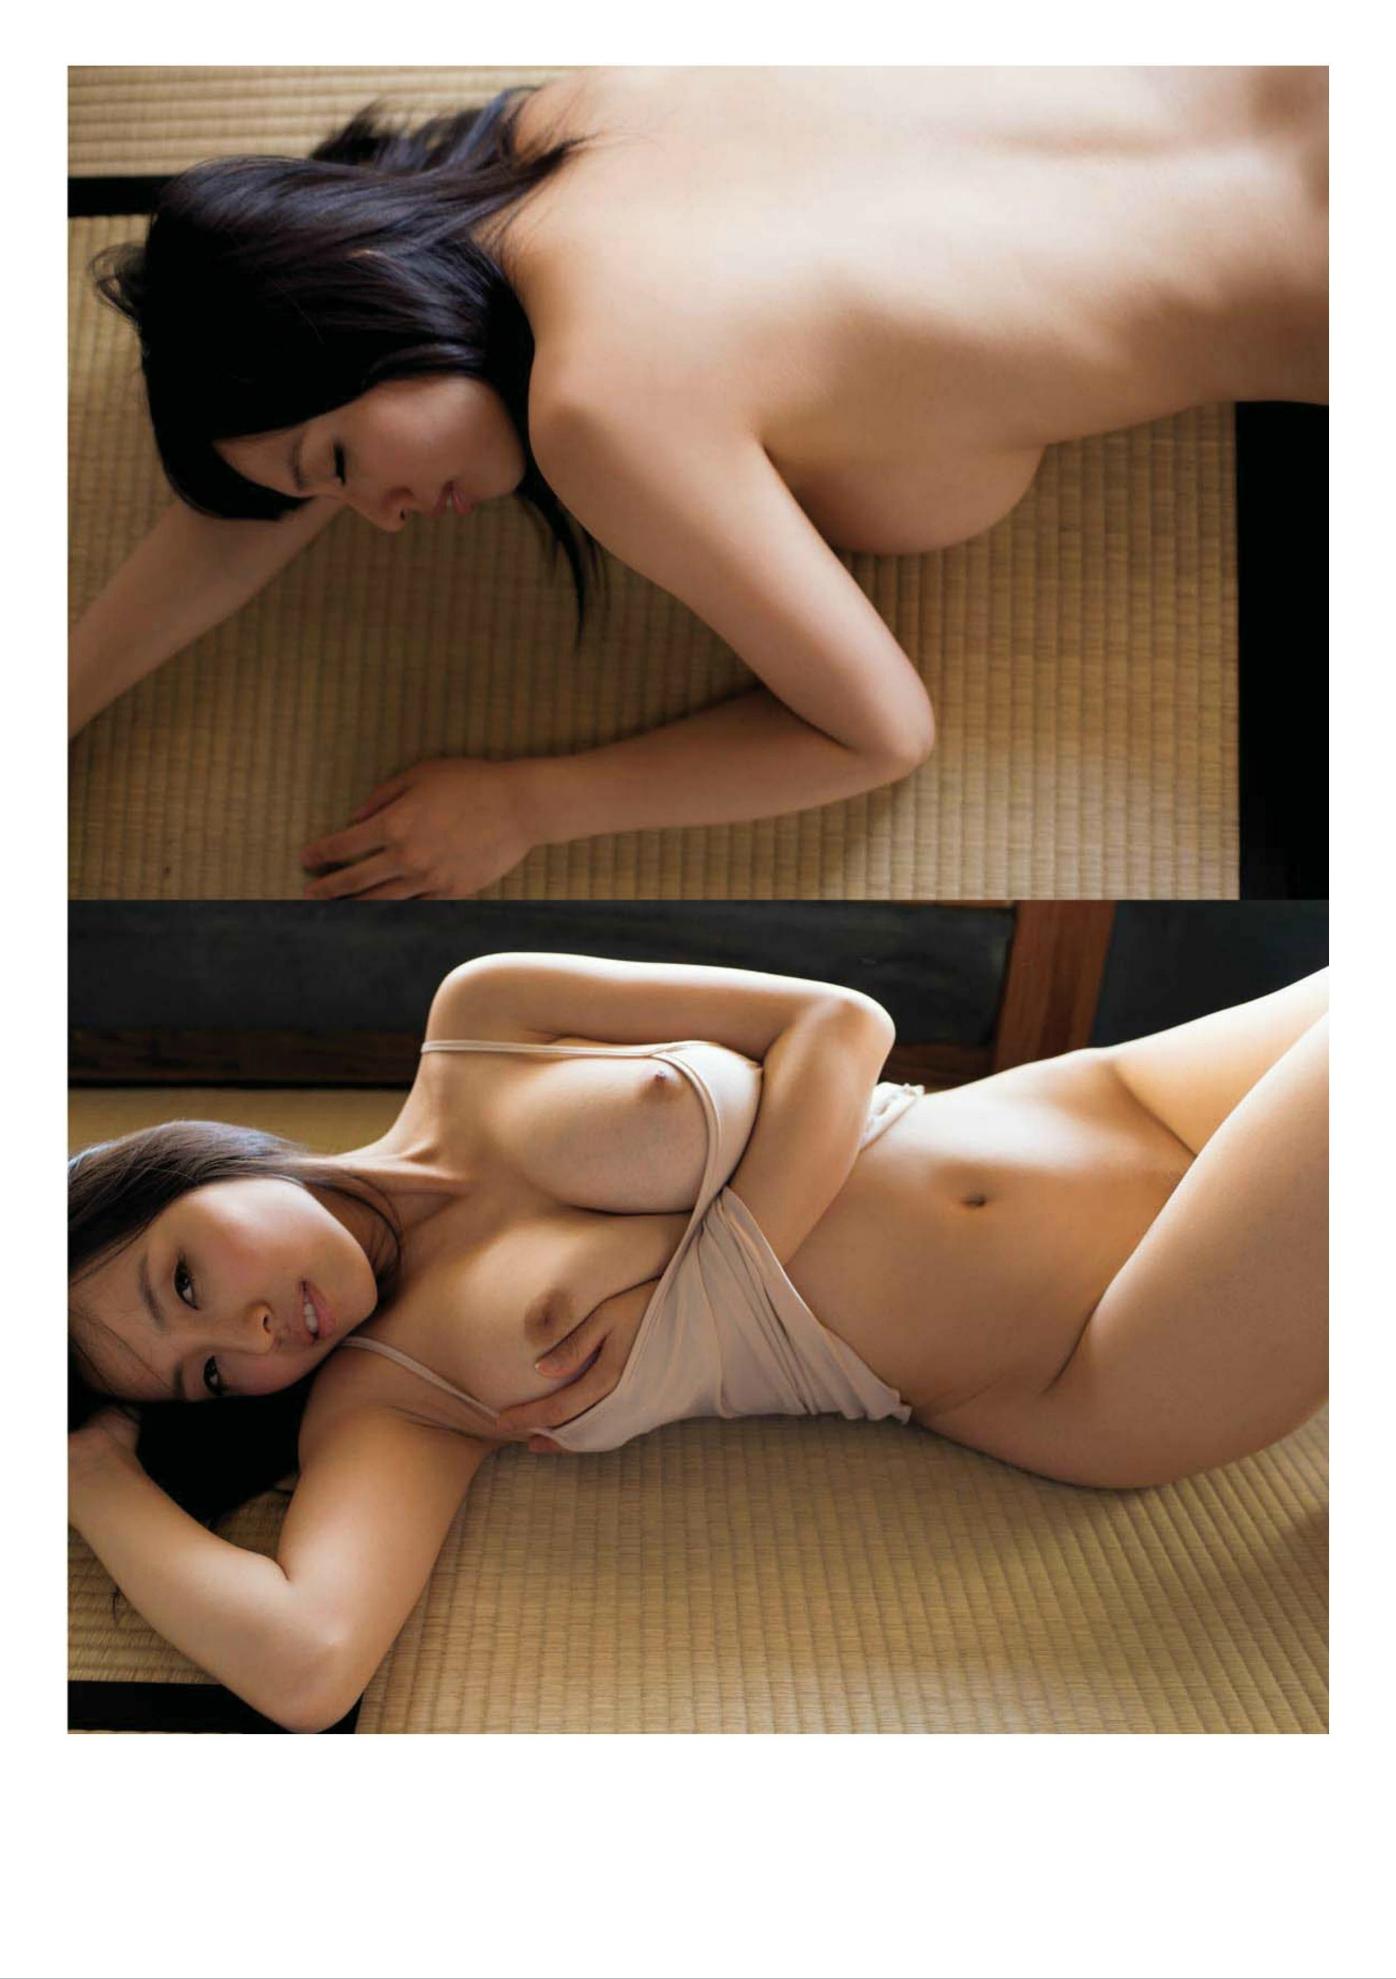 image http://scanlover.com/assets/images/2952-uqoq6qEsXT24KRbD.jpeg